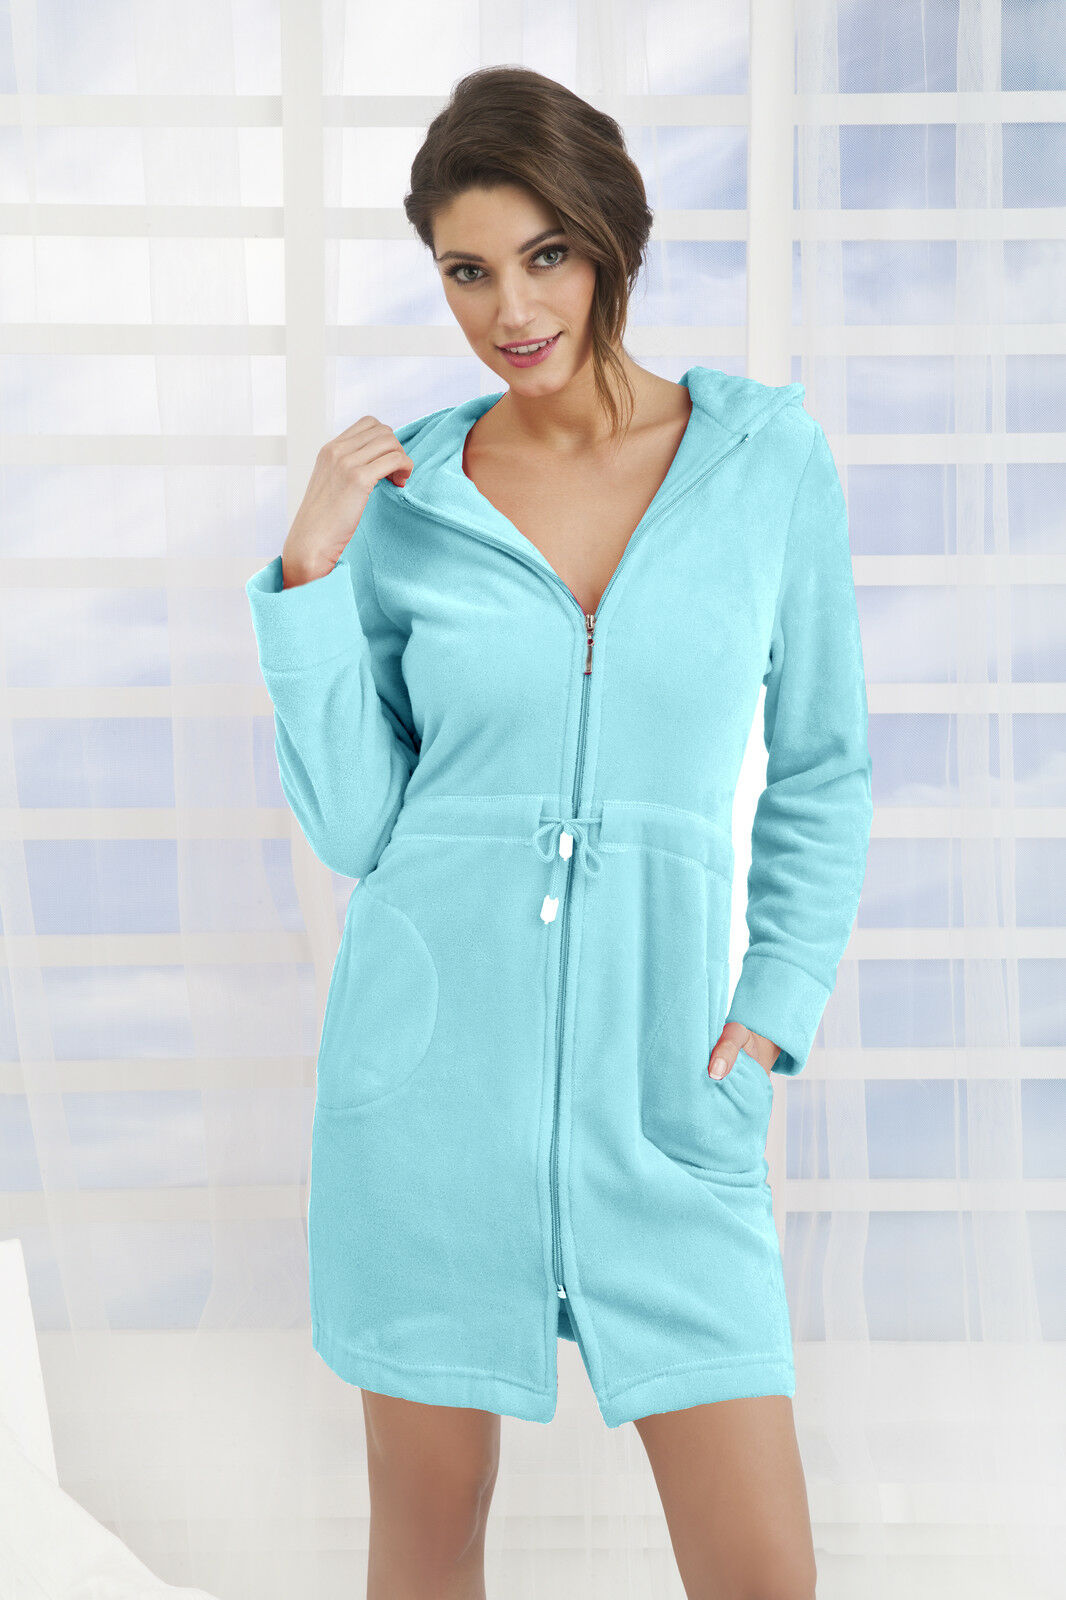 new womens cotton dress style bath robe housecoat dressing. Black Bedroom Furniture Sets. Home Design Ideas